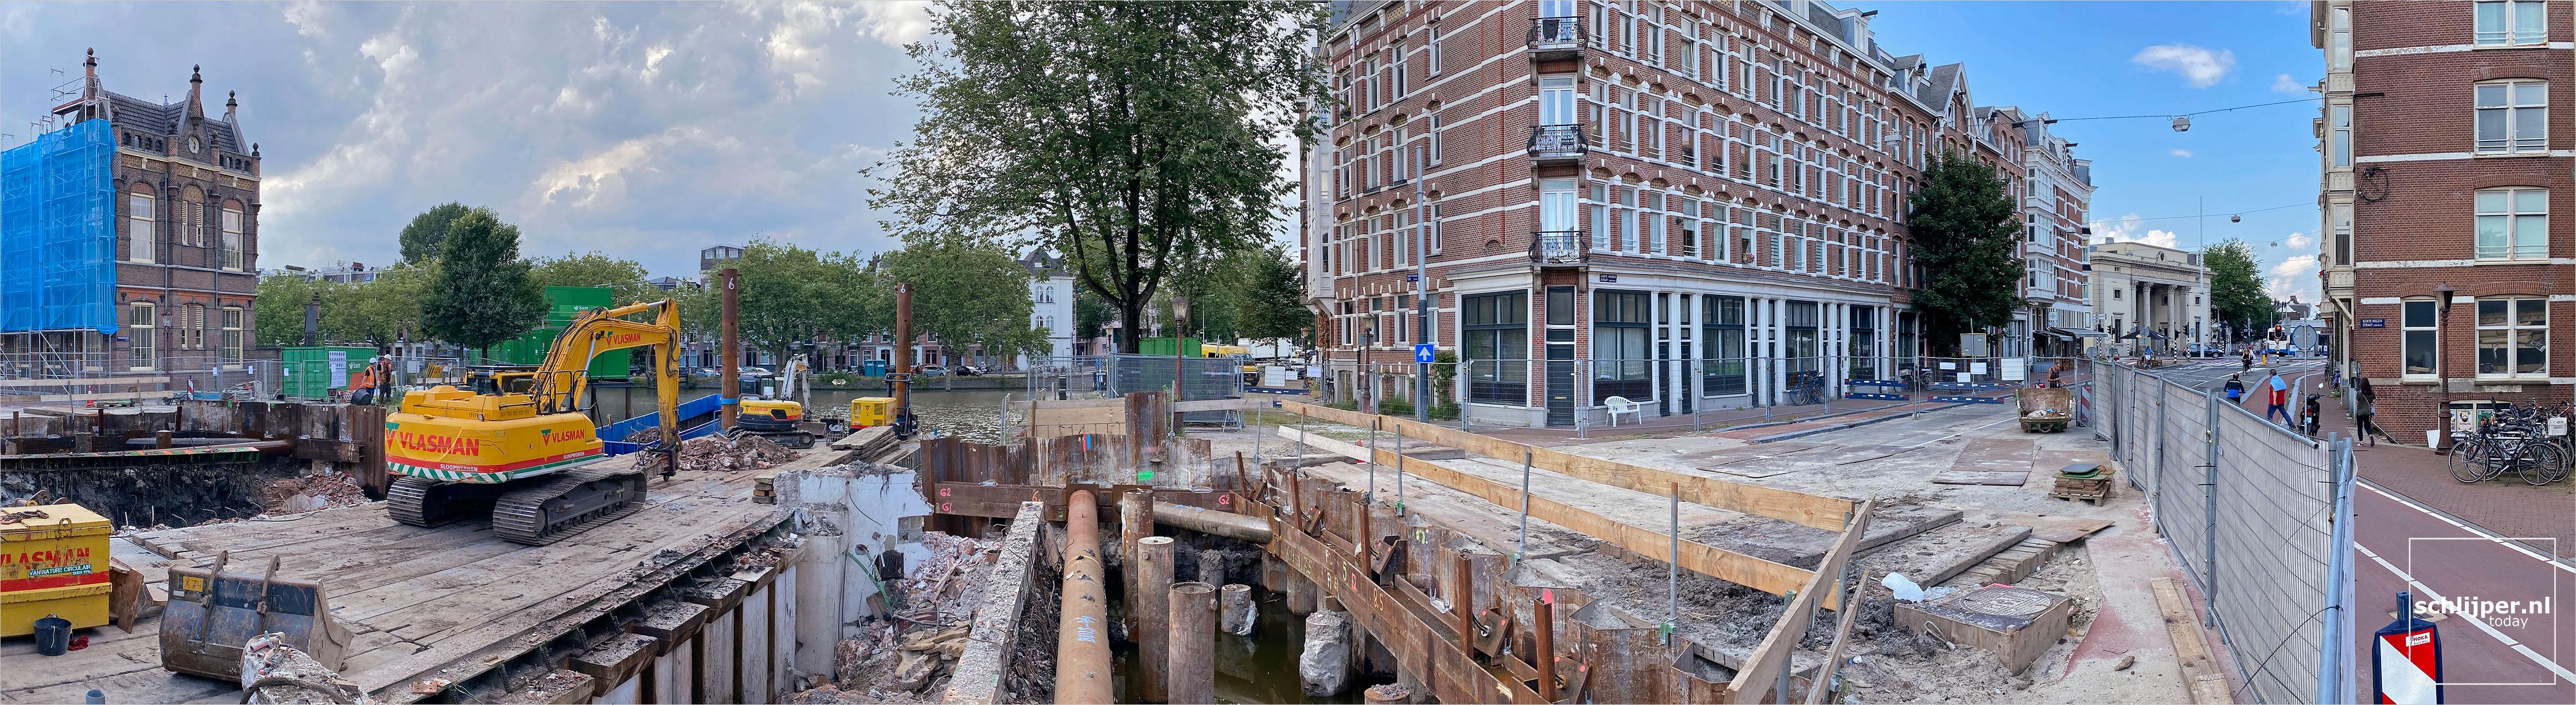 The Netherlands, Amsterdam, 4 augustus 2021